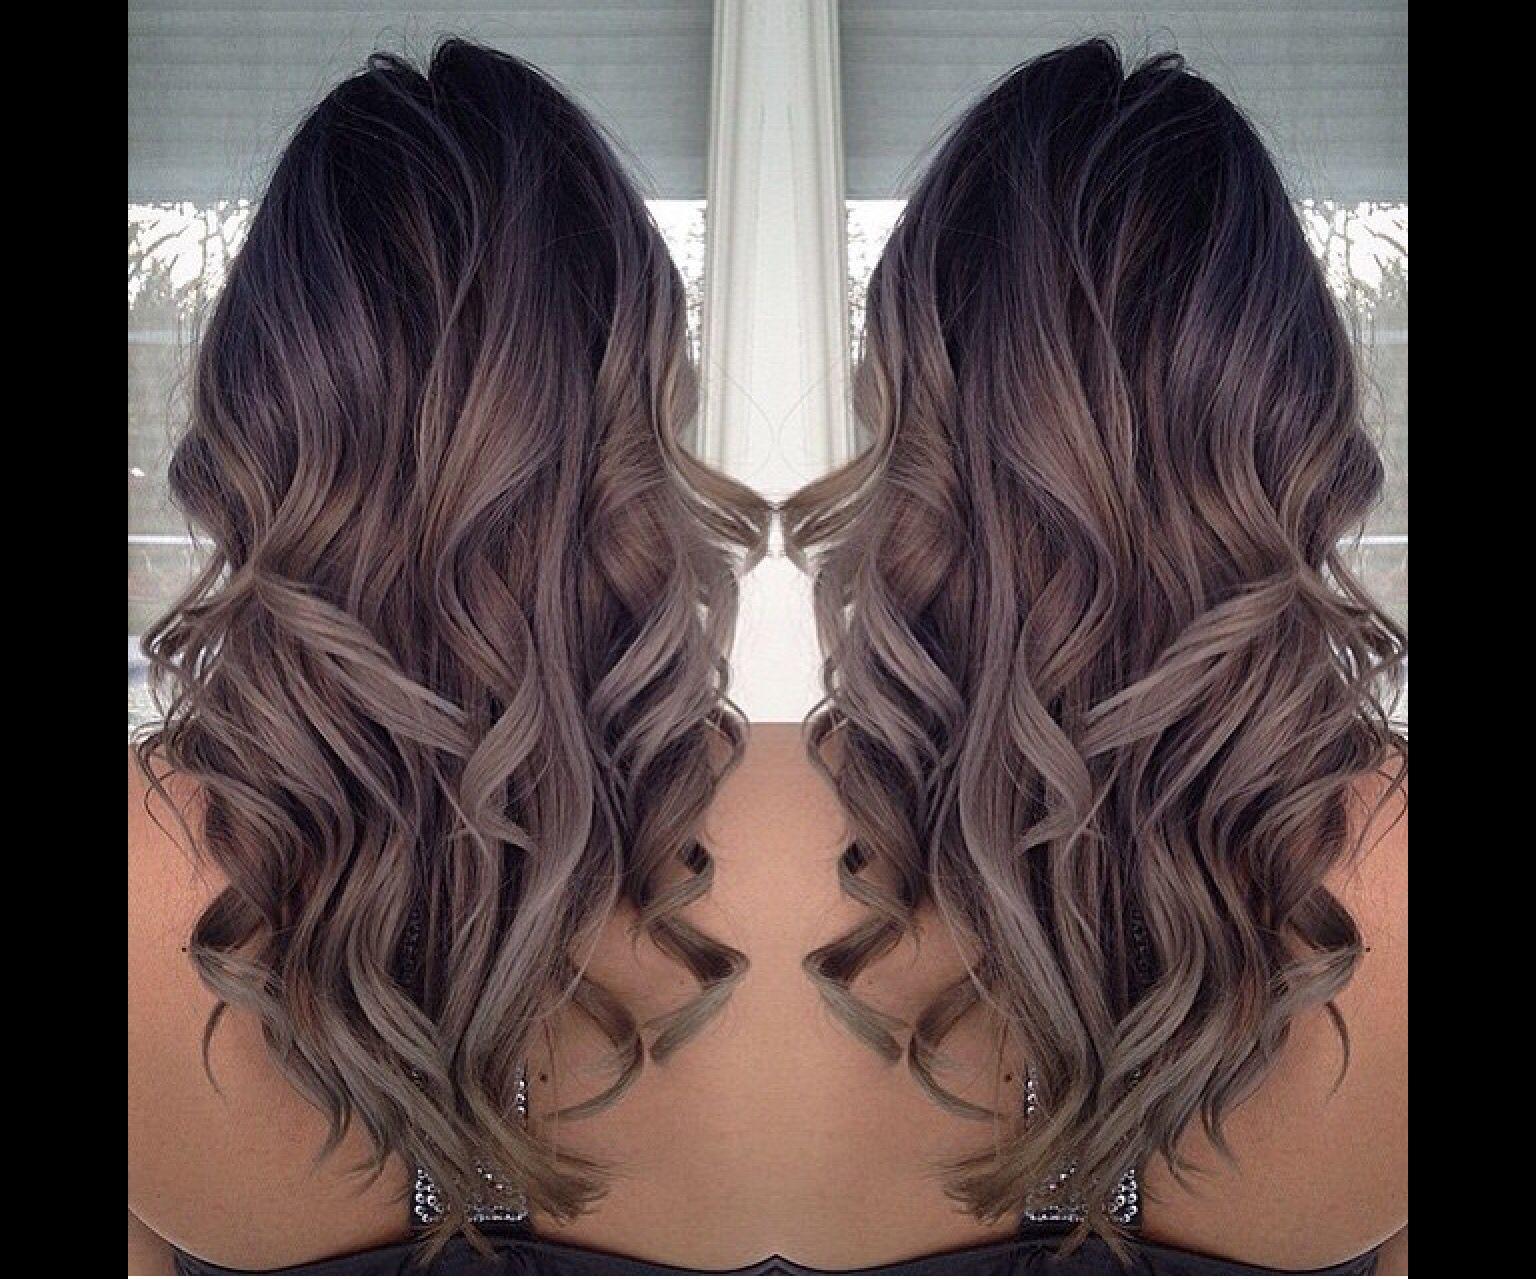 70 Flattering Balayage Hair Color Ideas For 2020 Long Thin Hair Hair Styles Haircuts For Fine Hair